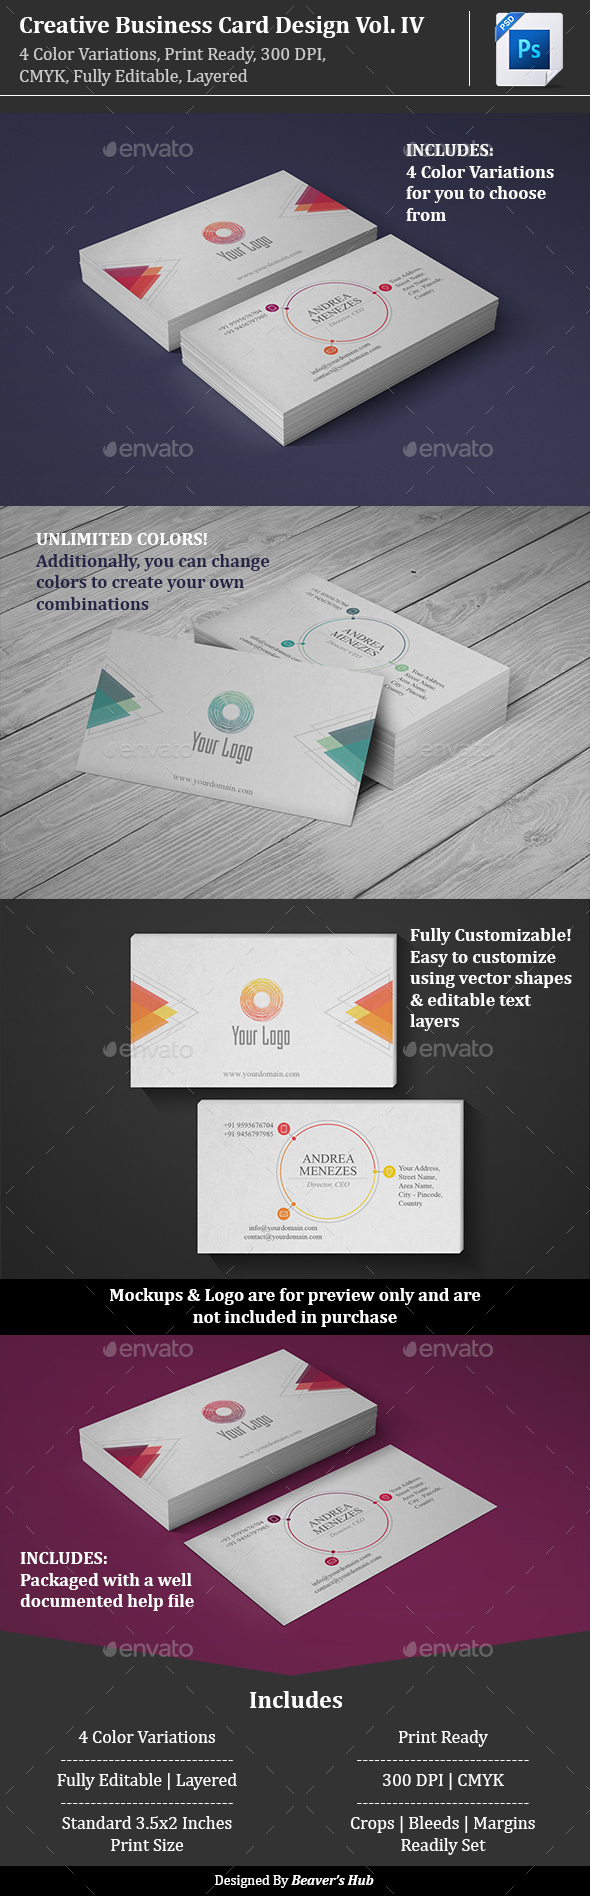 Creative Business Card Design Vol. 4 - Creative Business Cards